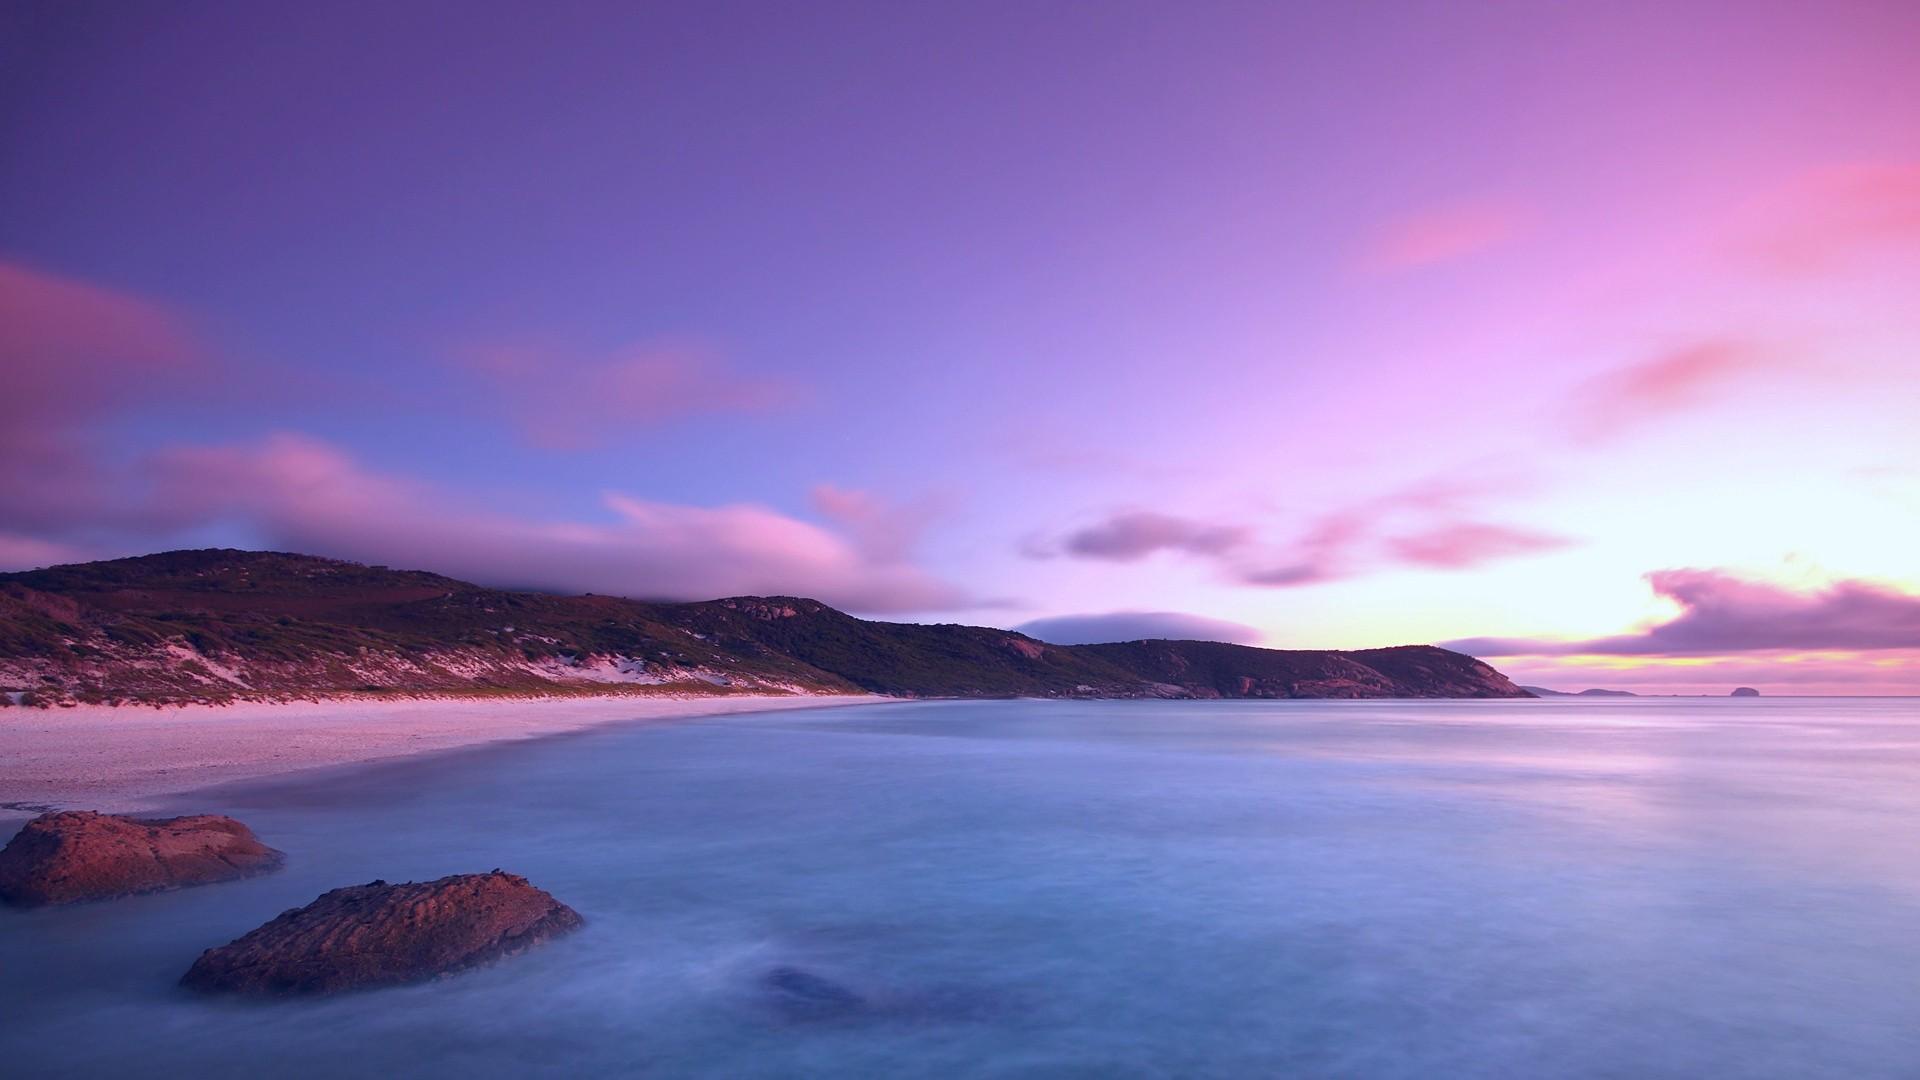 Purple Sunset hd wallpaper 1080